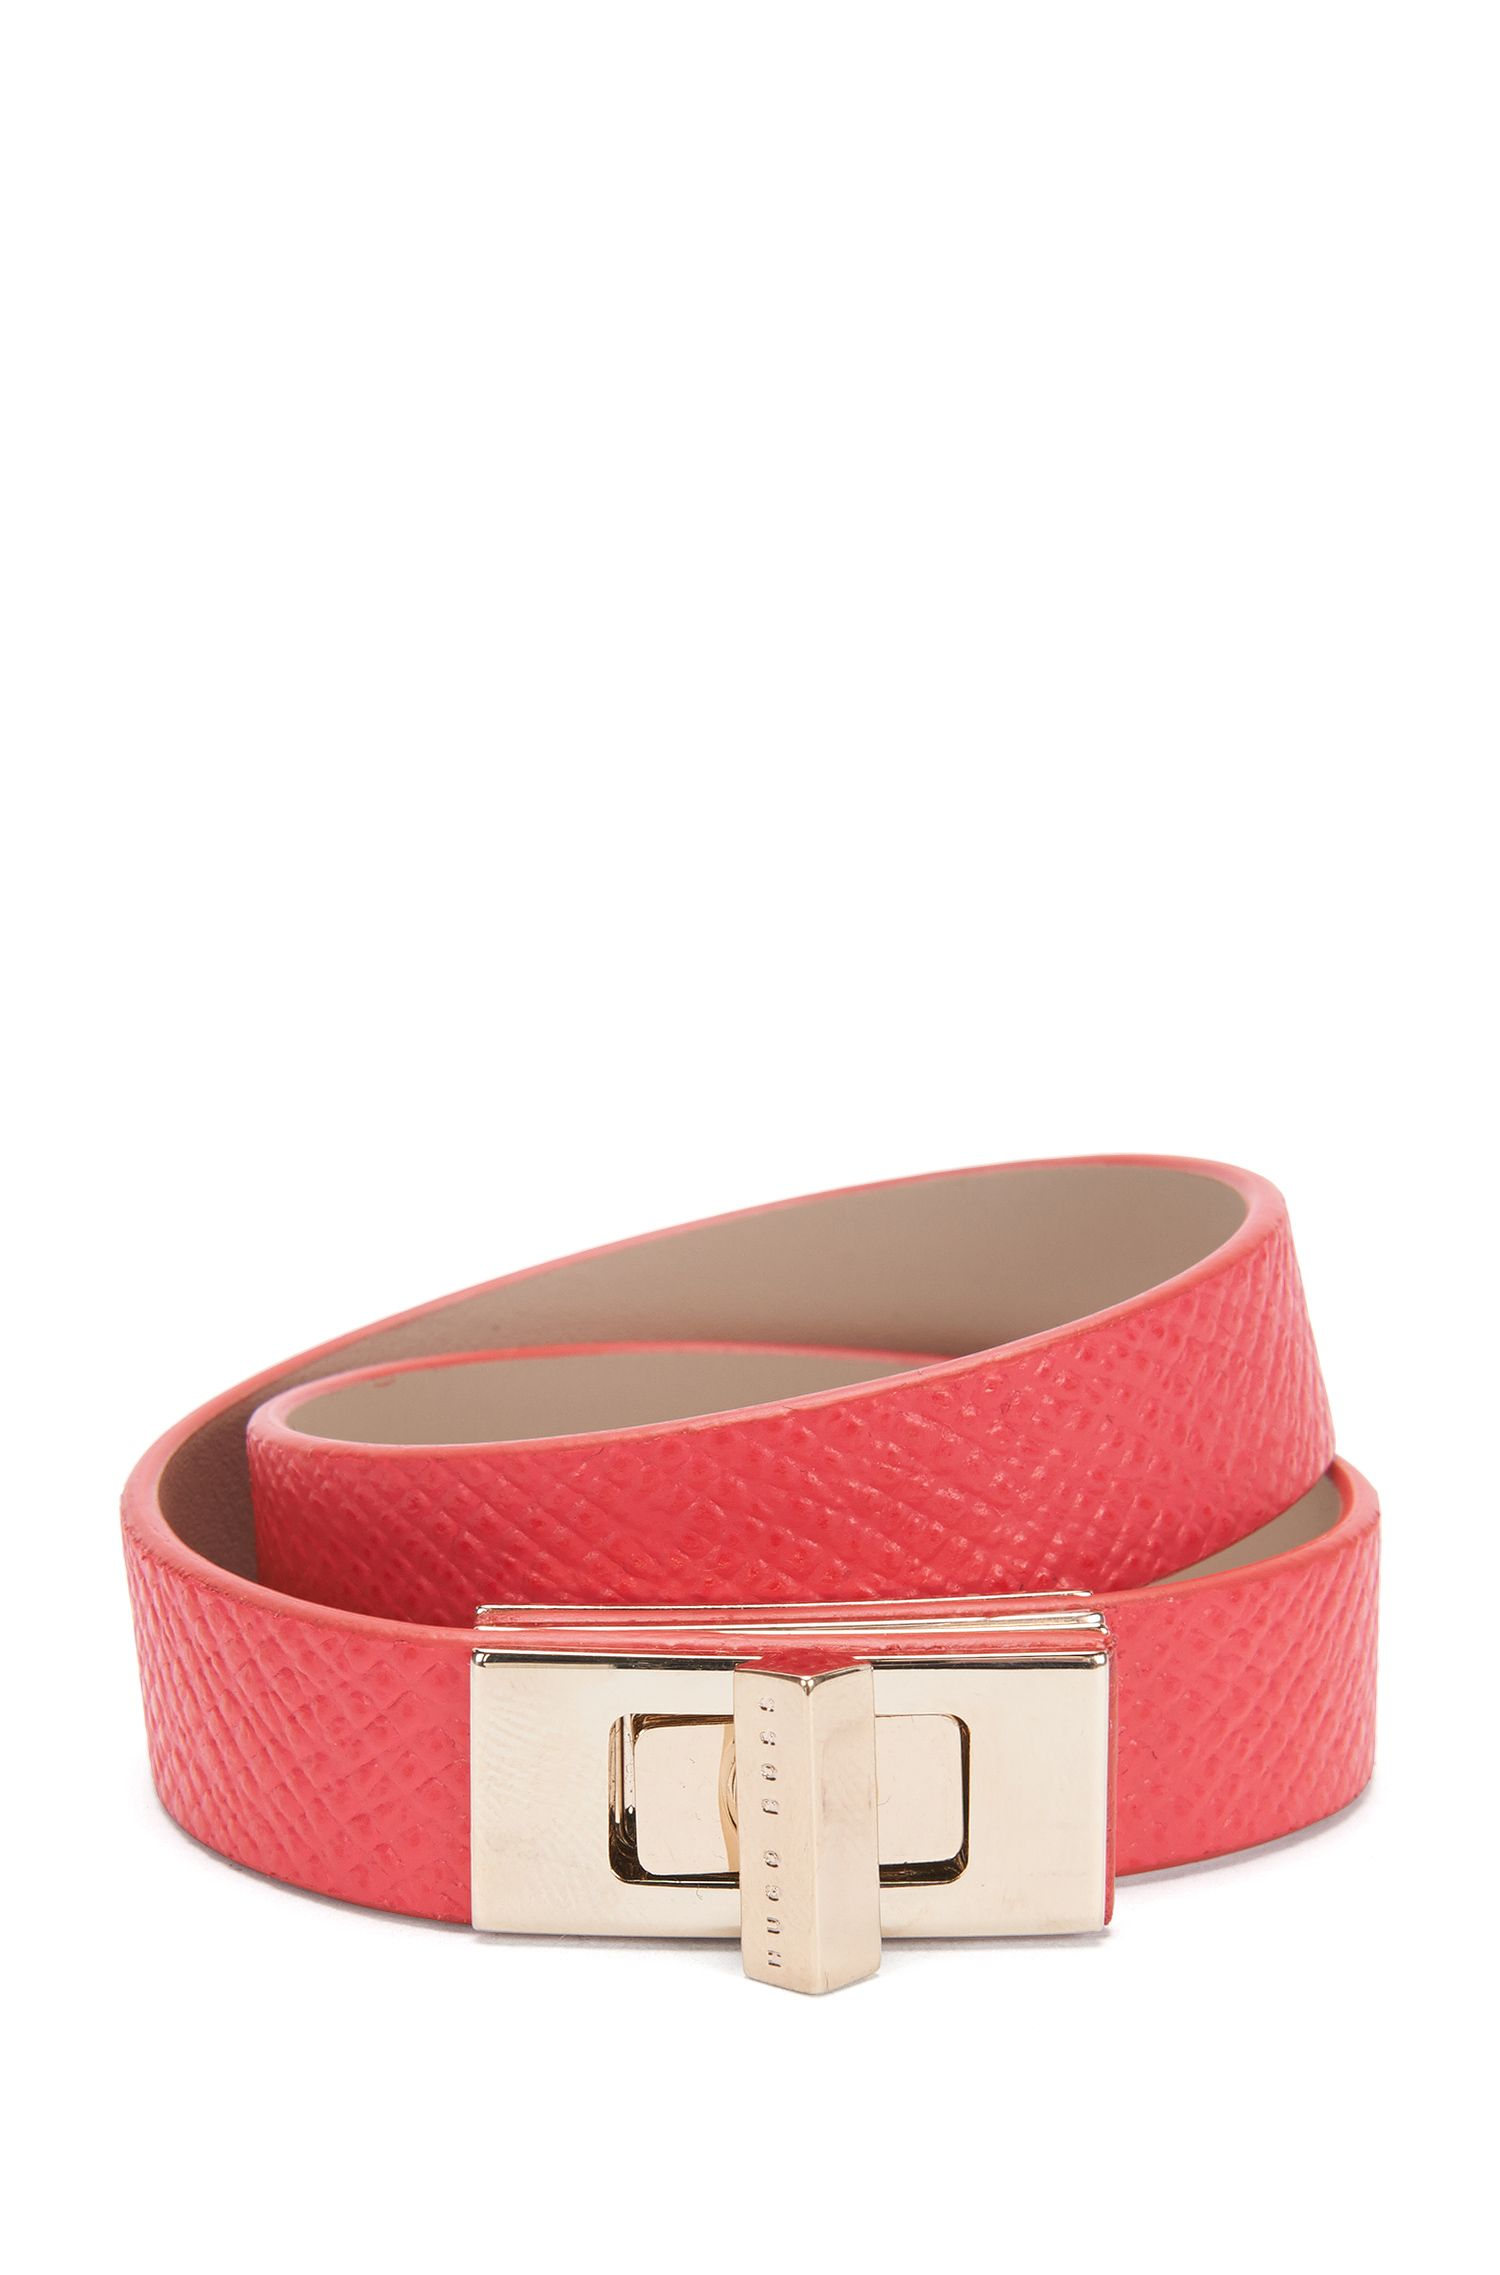 Bracelet à enrouler BOSS Bespoke en cuir